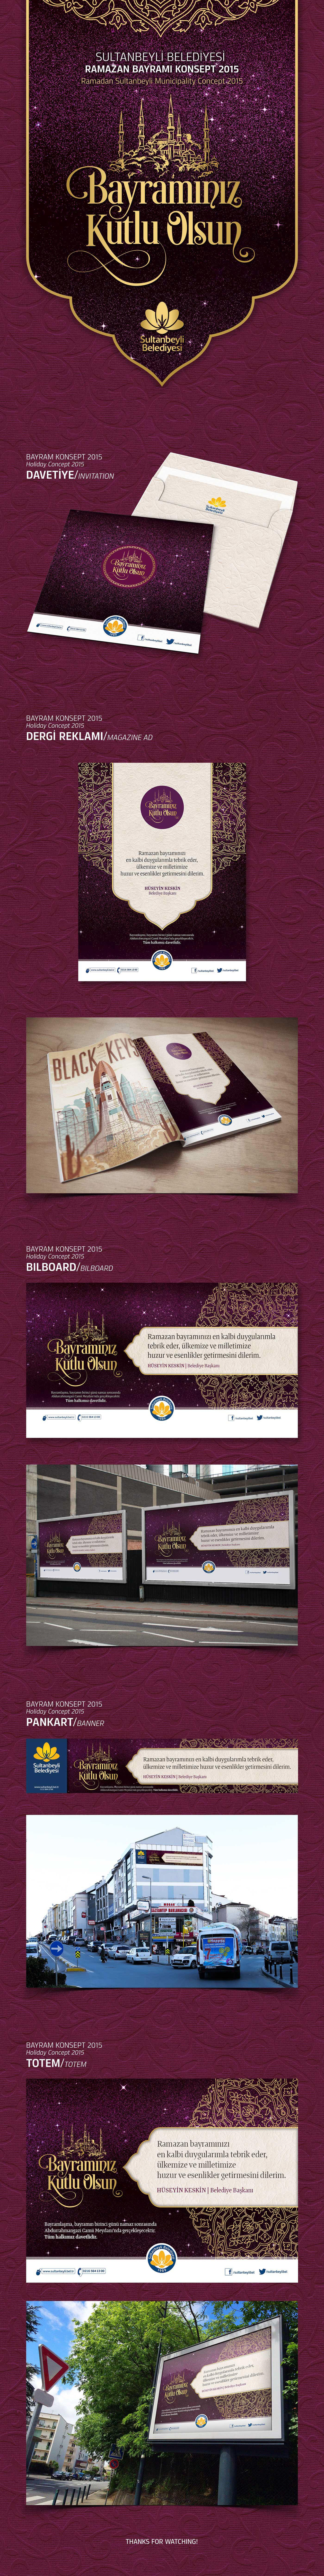 bayram Holiday bilboard brochure broşür katalog Invitation poster Afiş fuar Fair Outdoor banner art logo